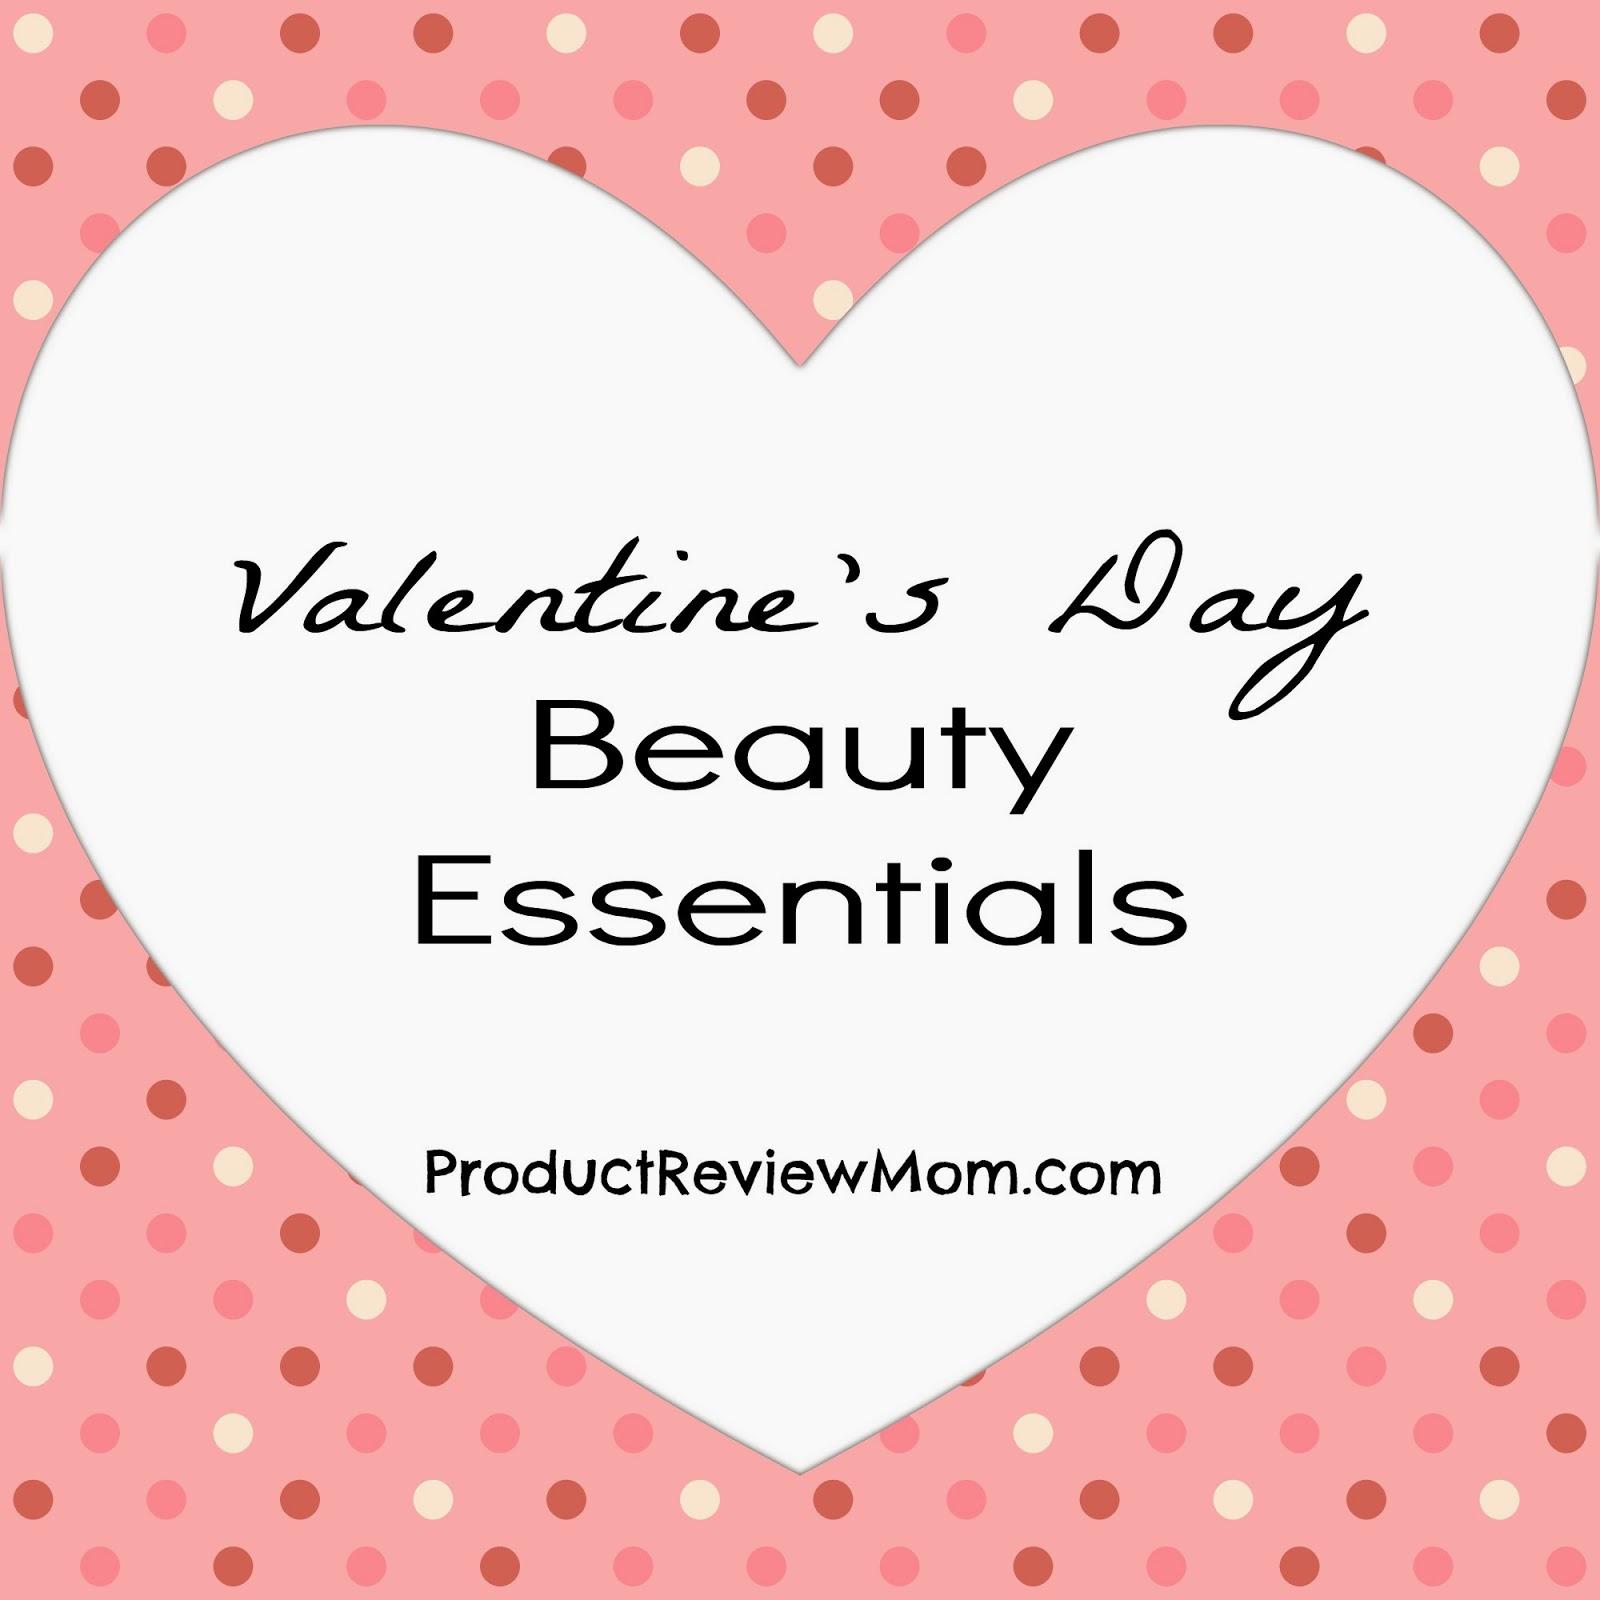 Valentine's Day Beauty Essentials via www.productreviewmom.com